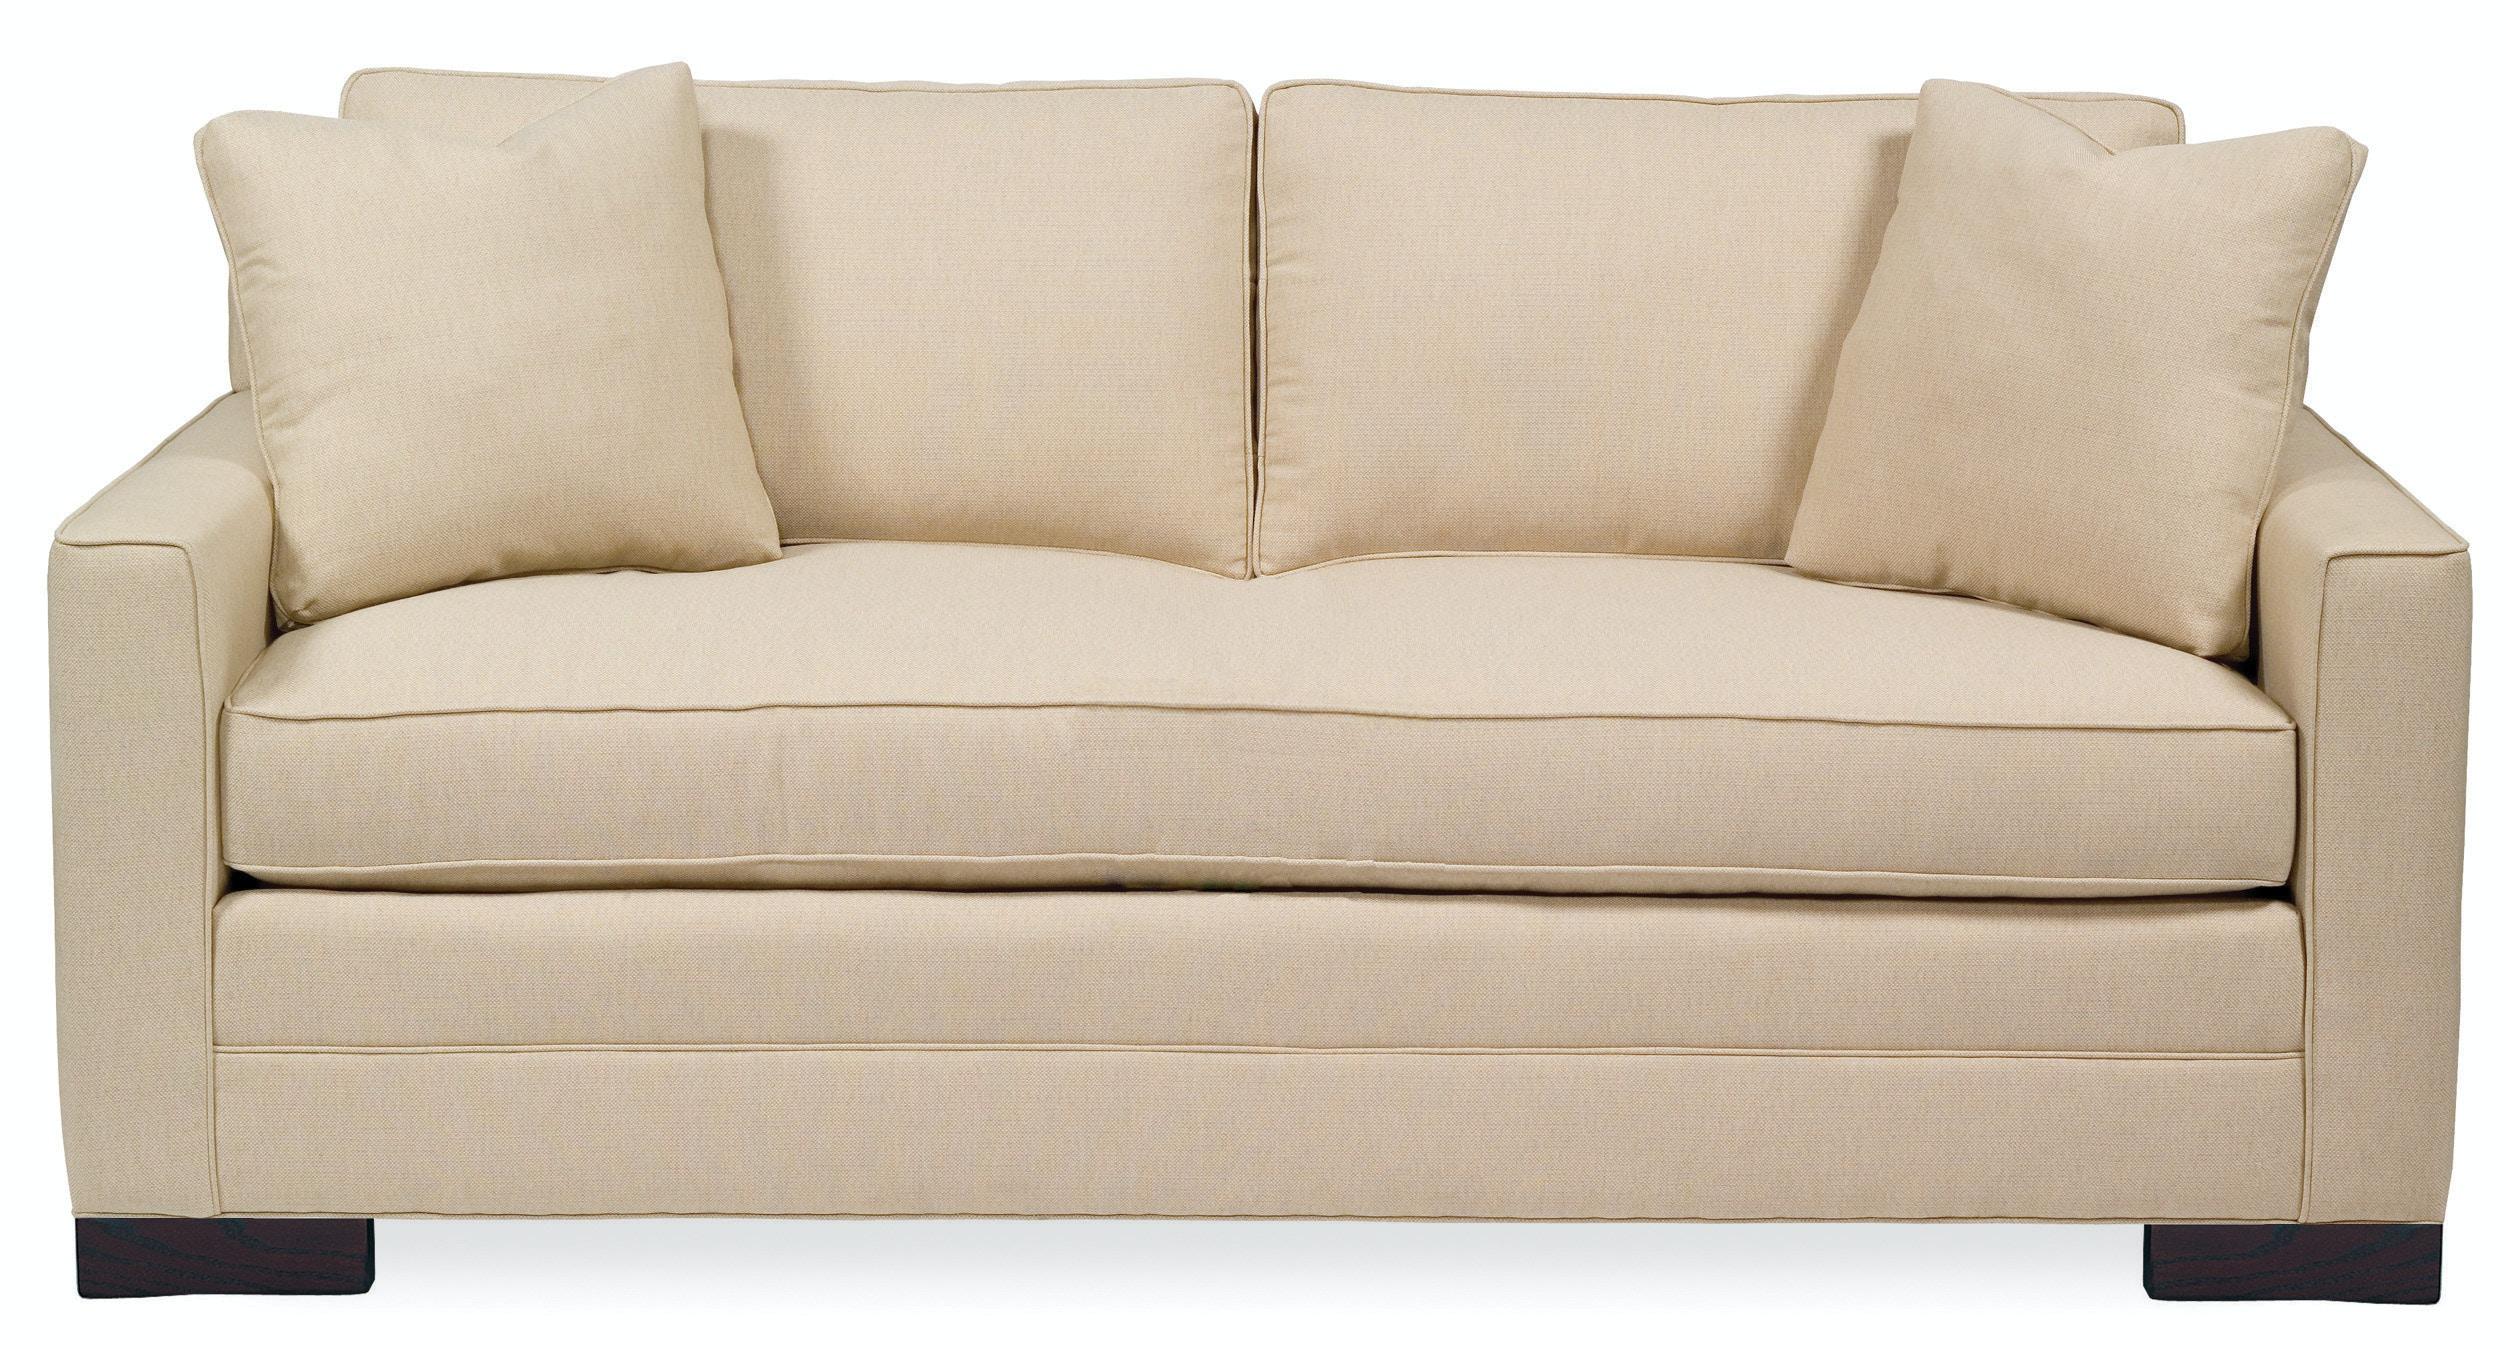 Vanguard Summerton Sofa 610 1S